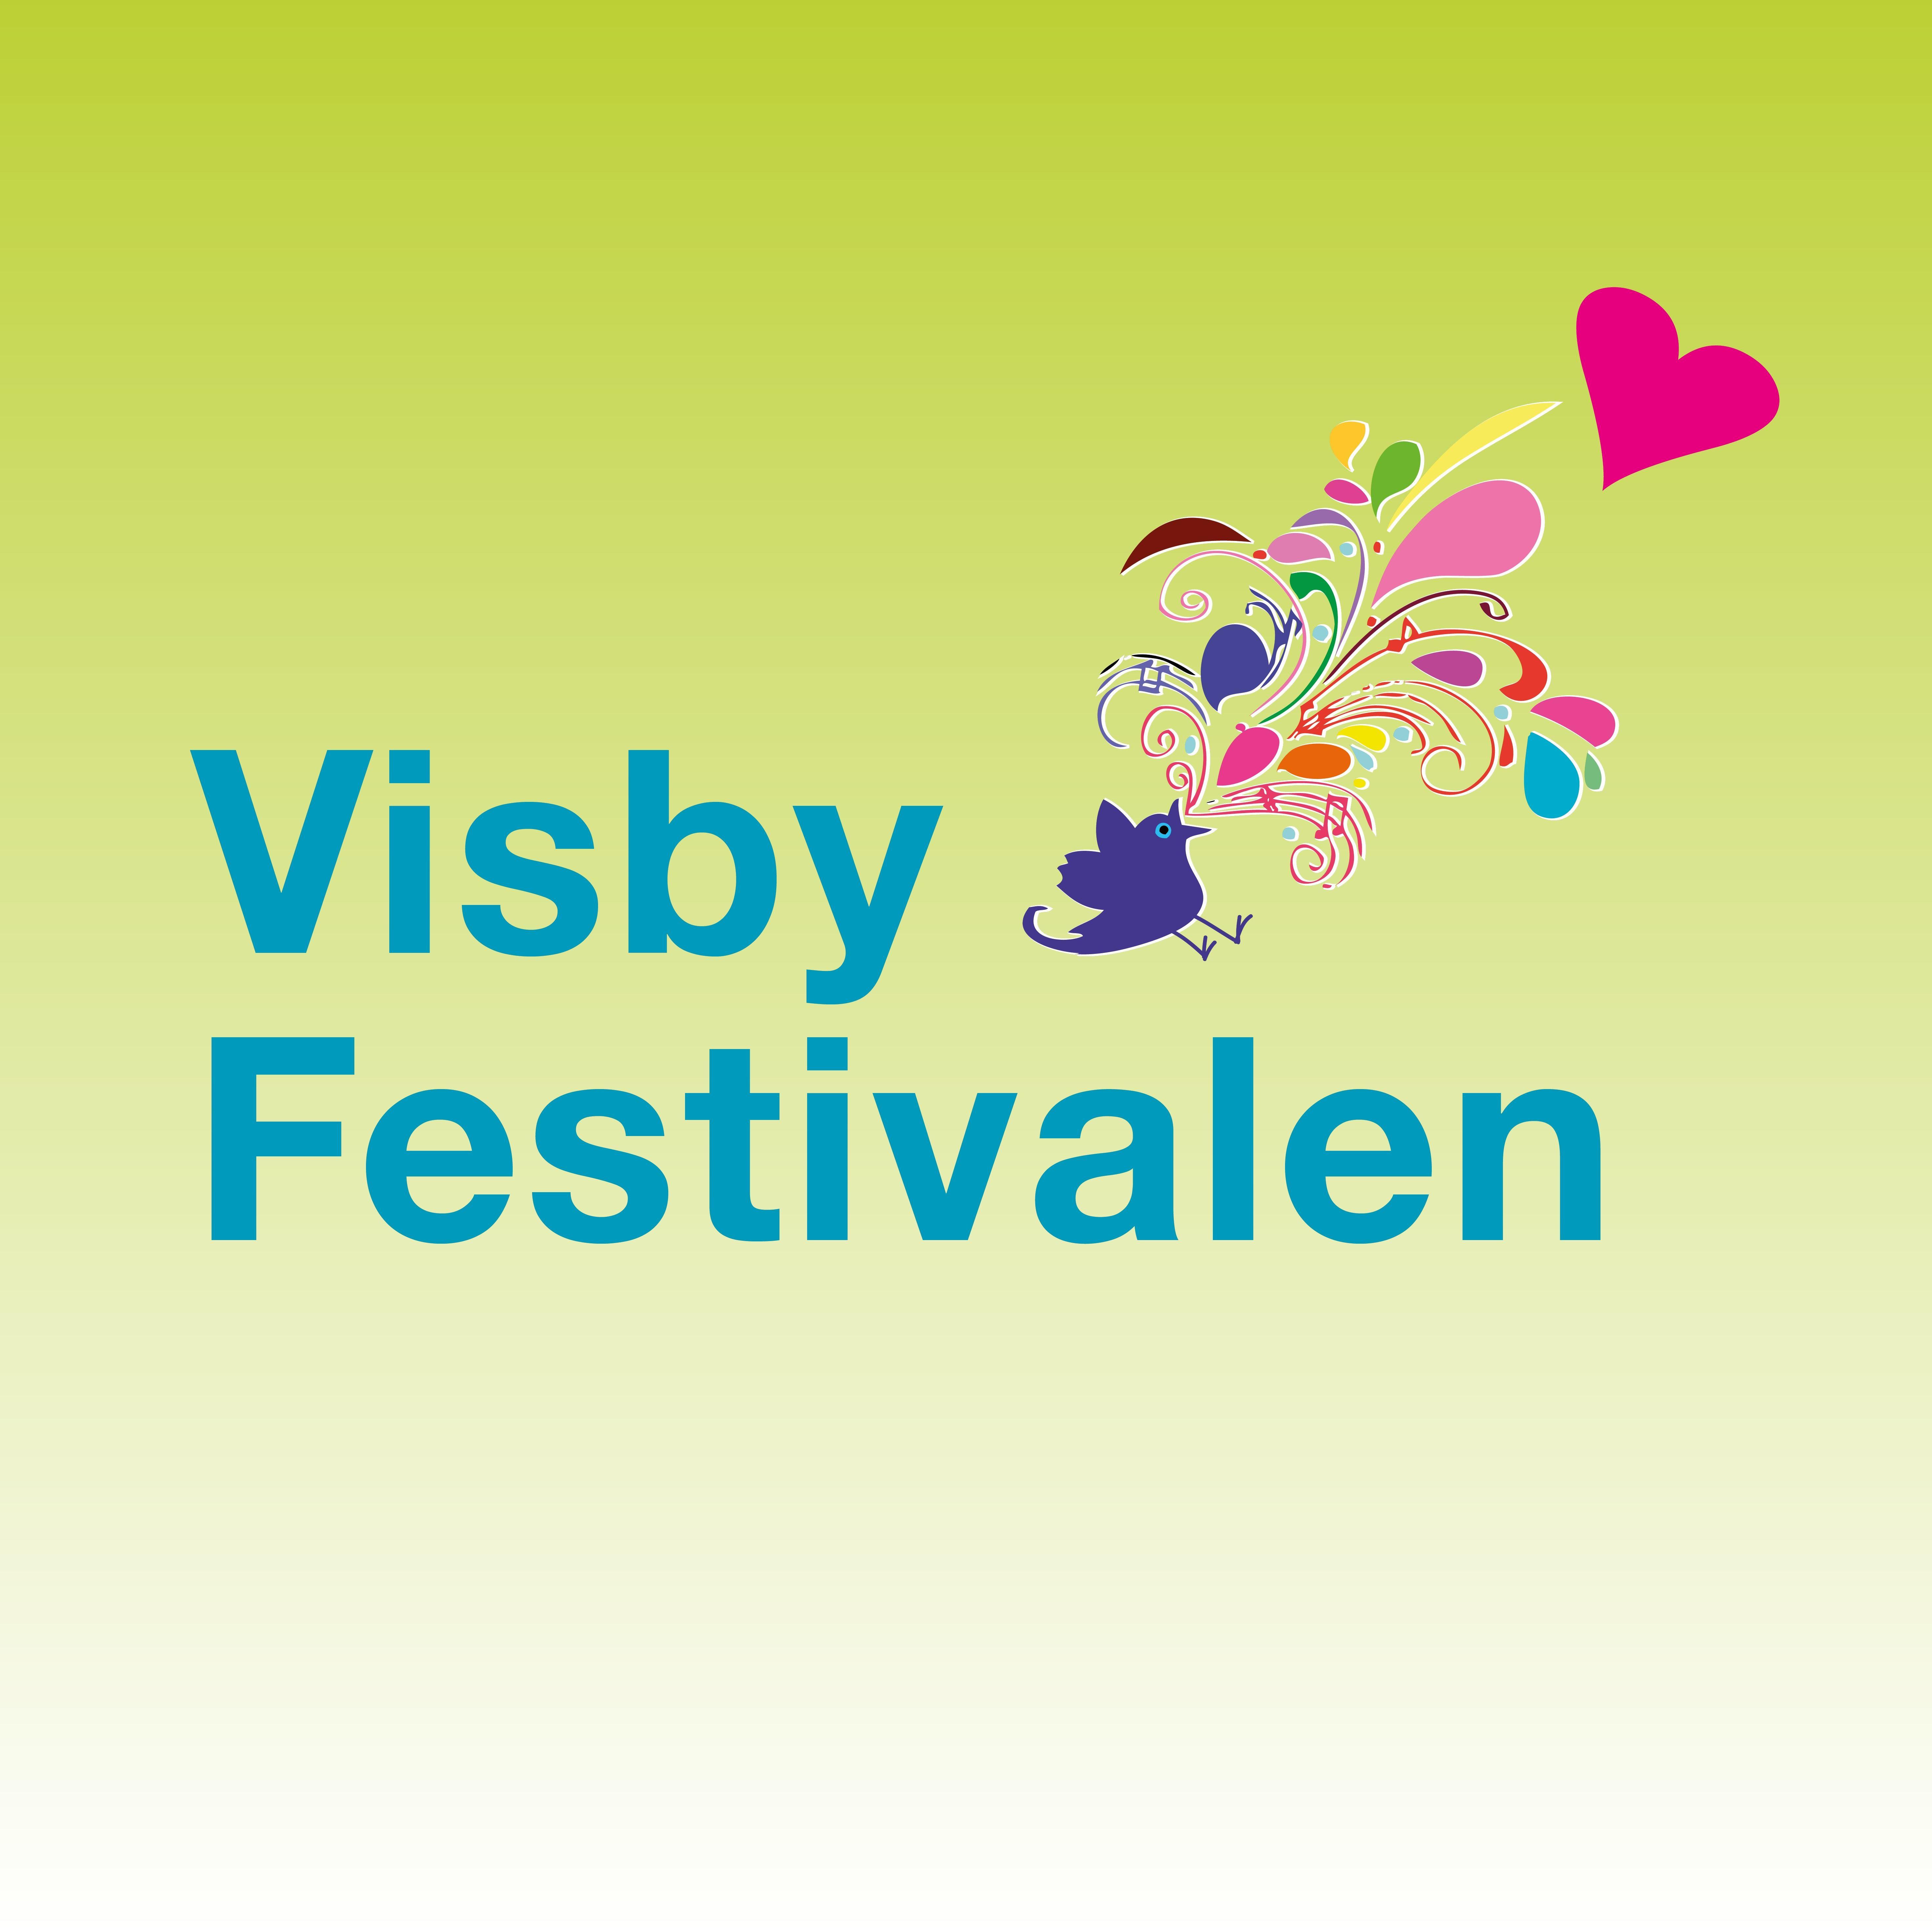 Visbyfestivalen